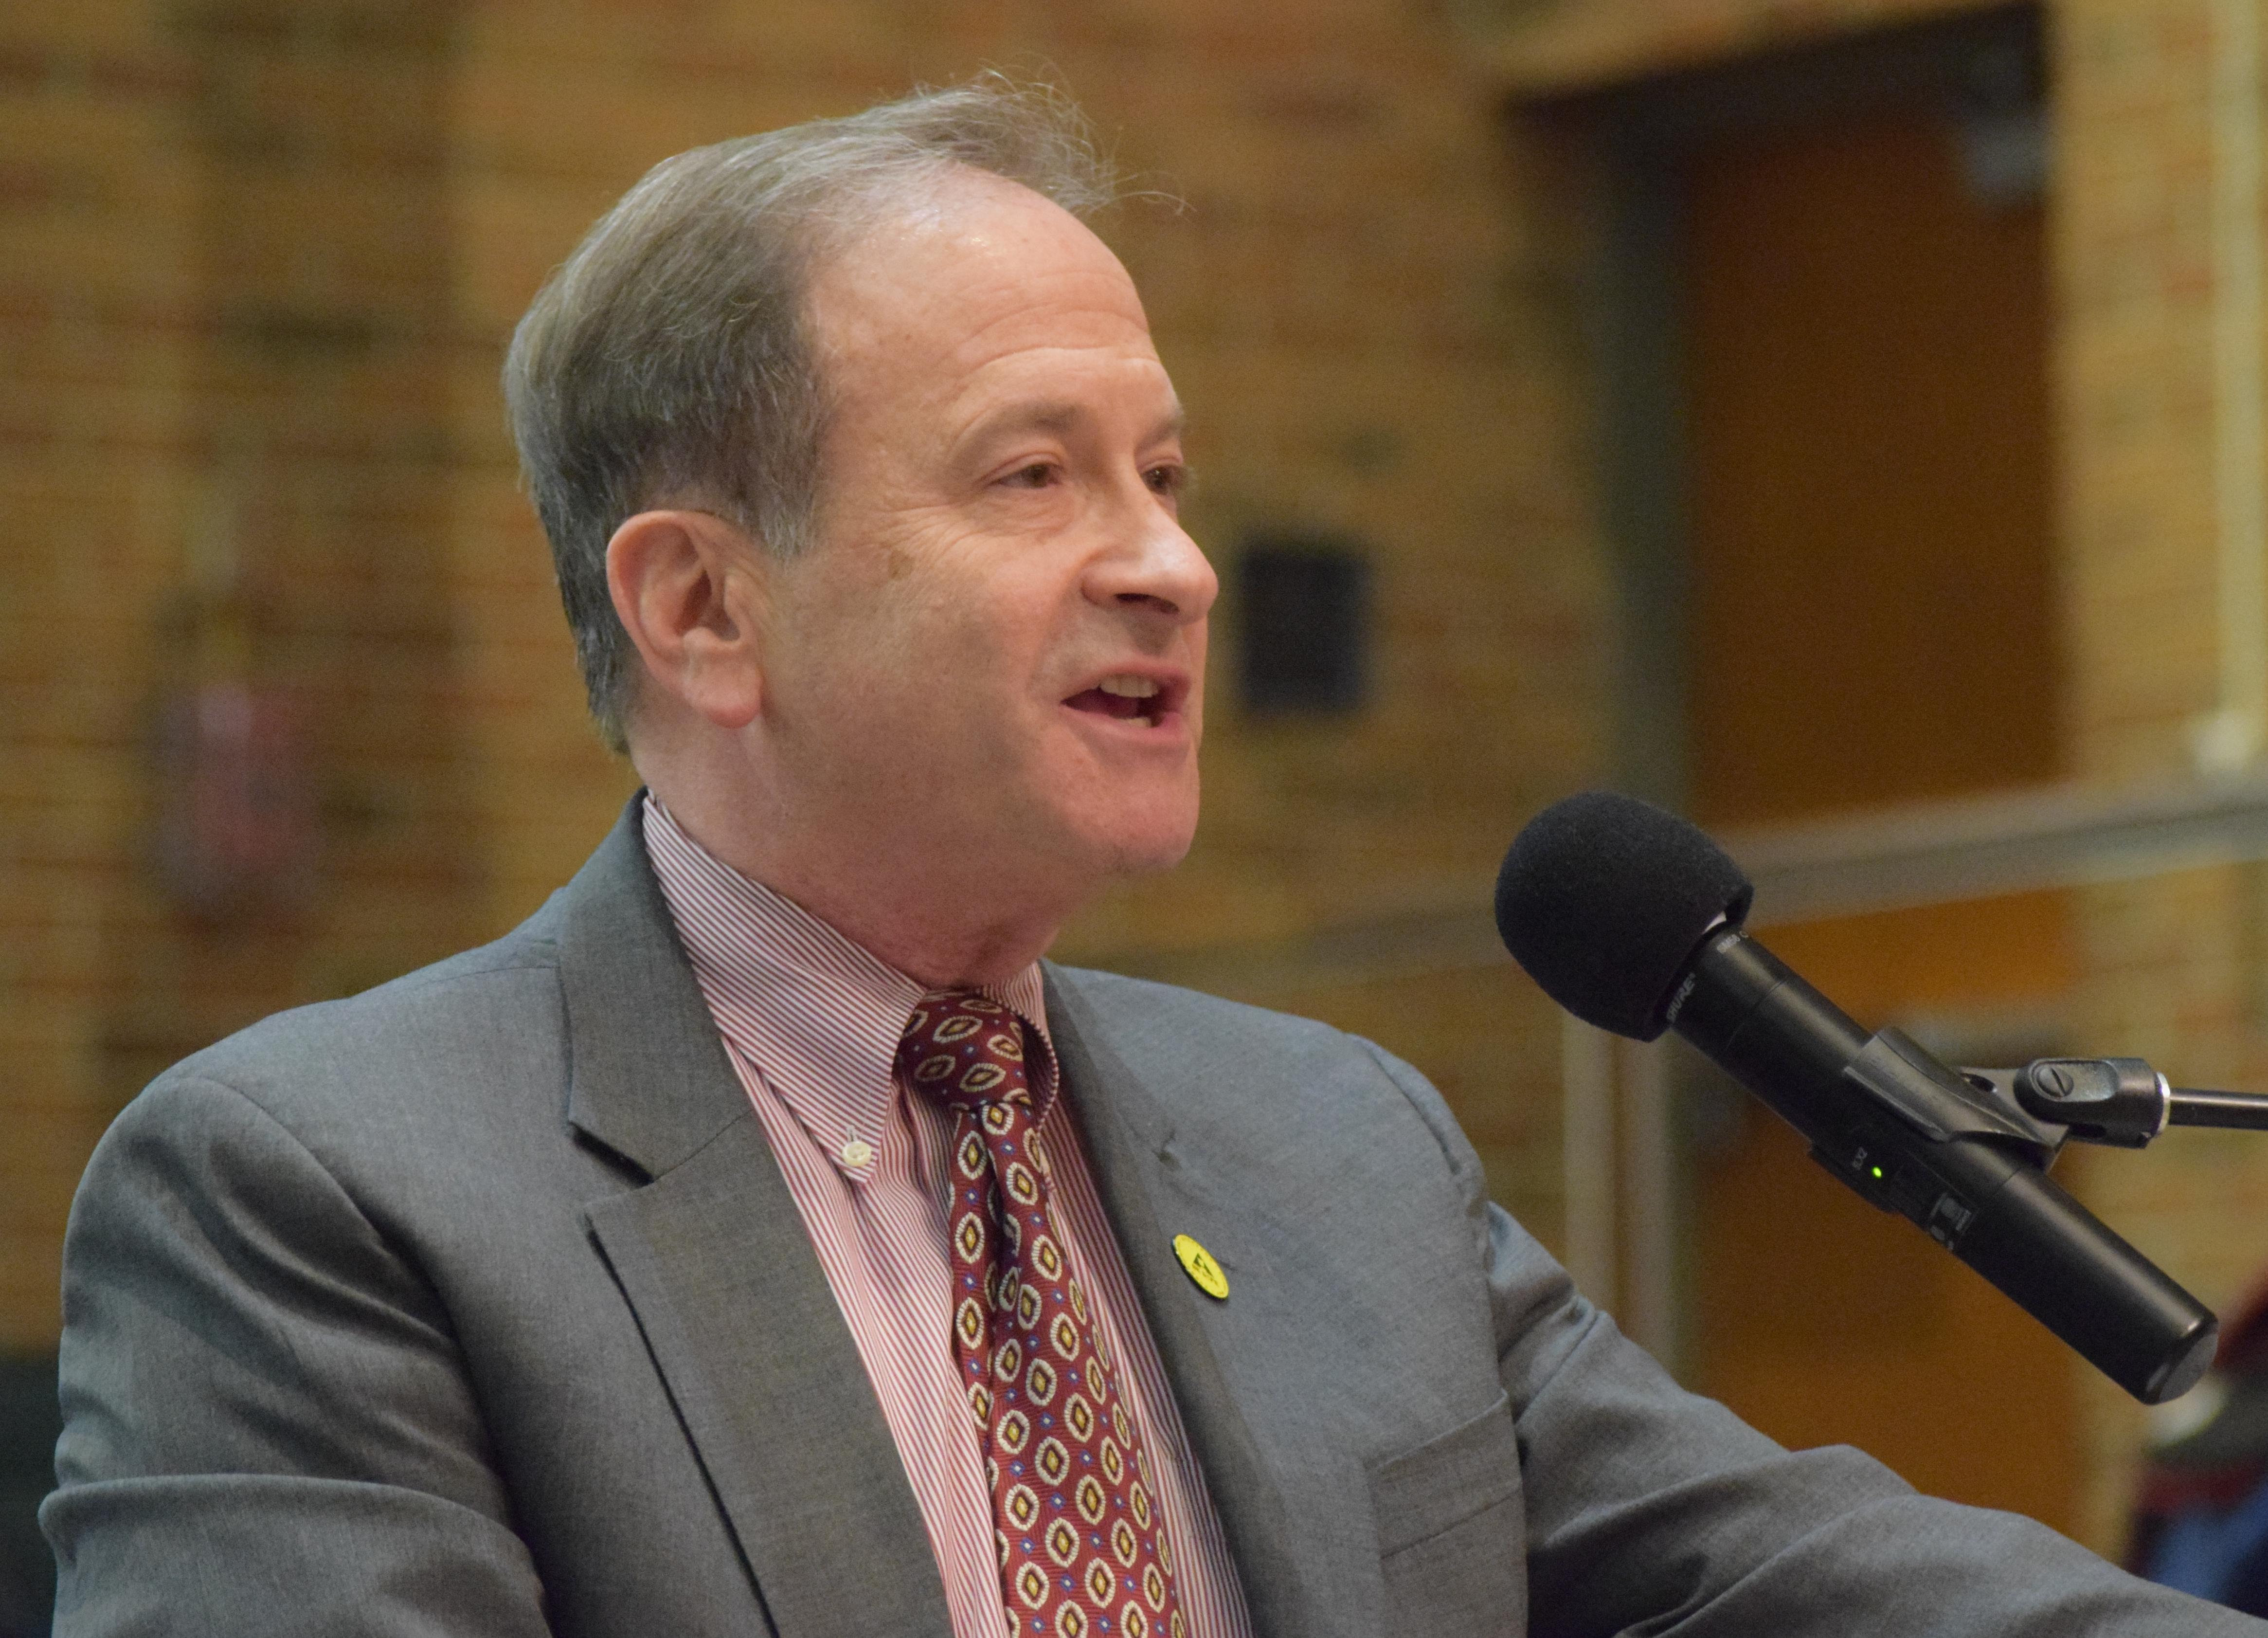 Ann Arbor City Administrator Howard Lazarus speaking at a podium